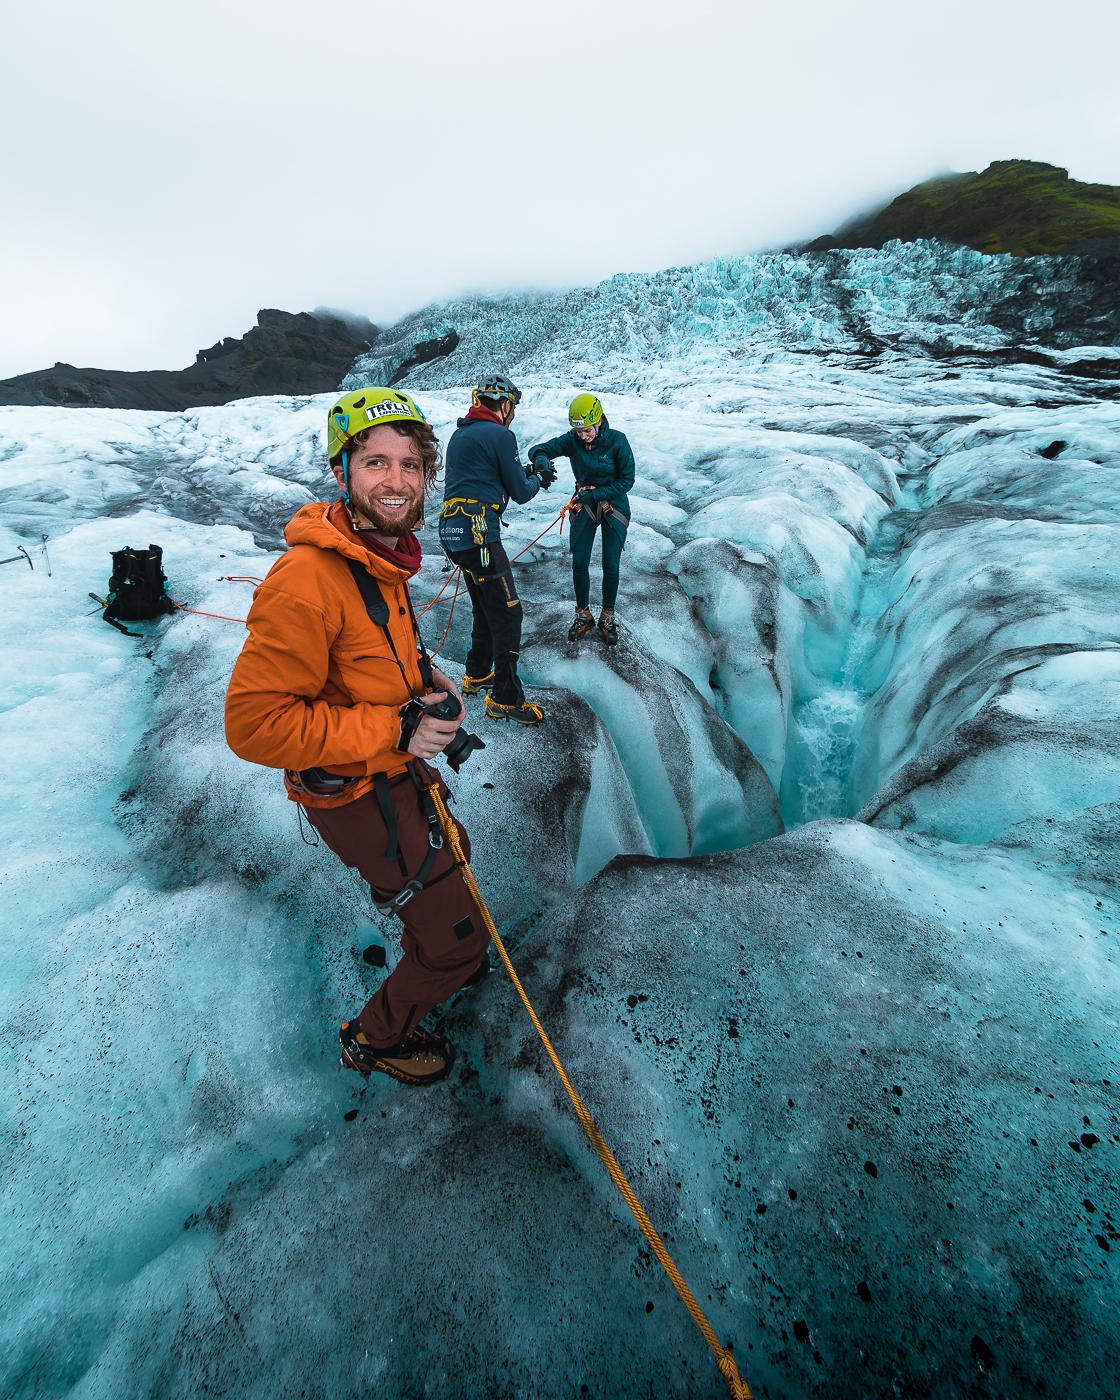 gabornagy_photography_iceland_glacier19.jpg